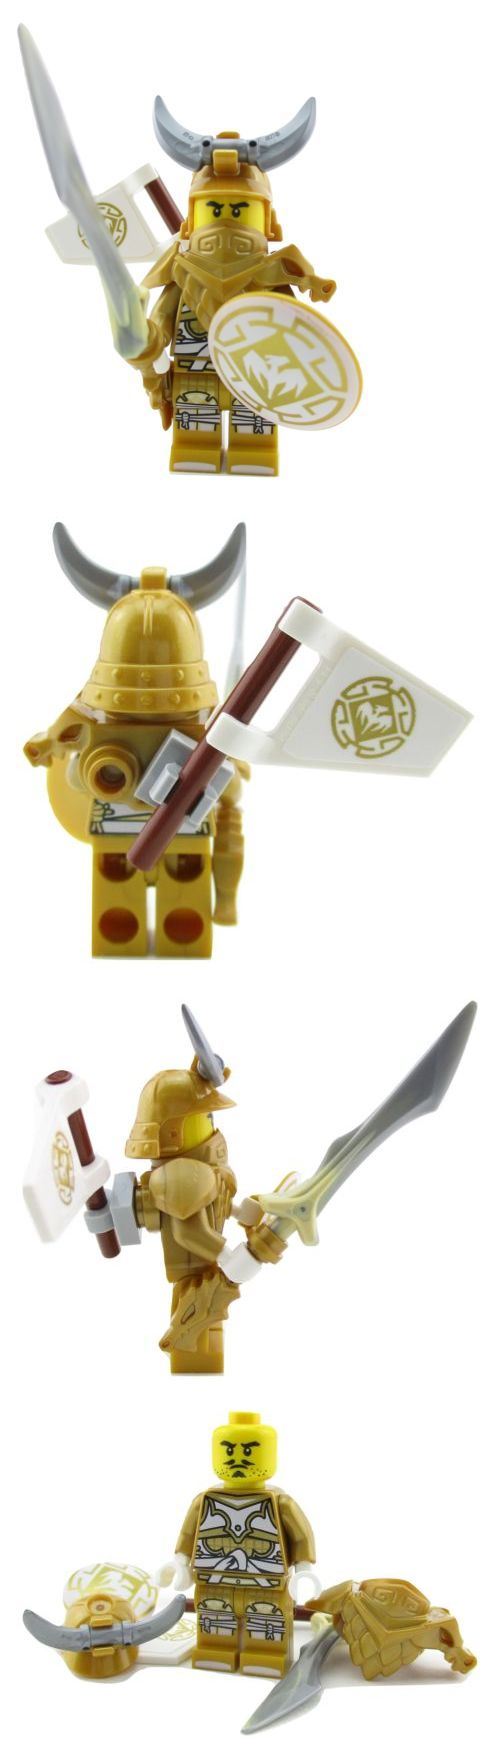 Lego Ninjago Golden Dragon Armor Master Minifigure 70655 Hunted Mini Fig The golden dragon armor( ninjago season 9: luoghi invisibili